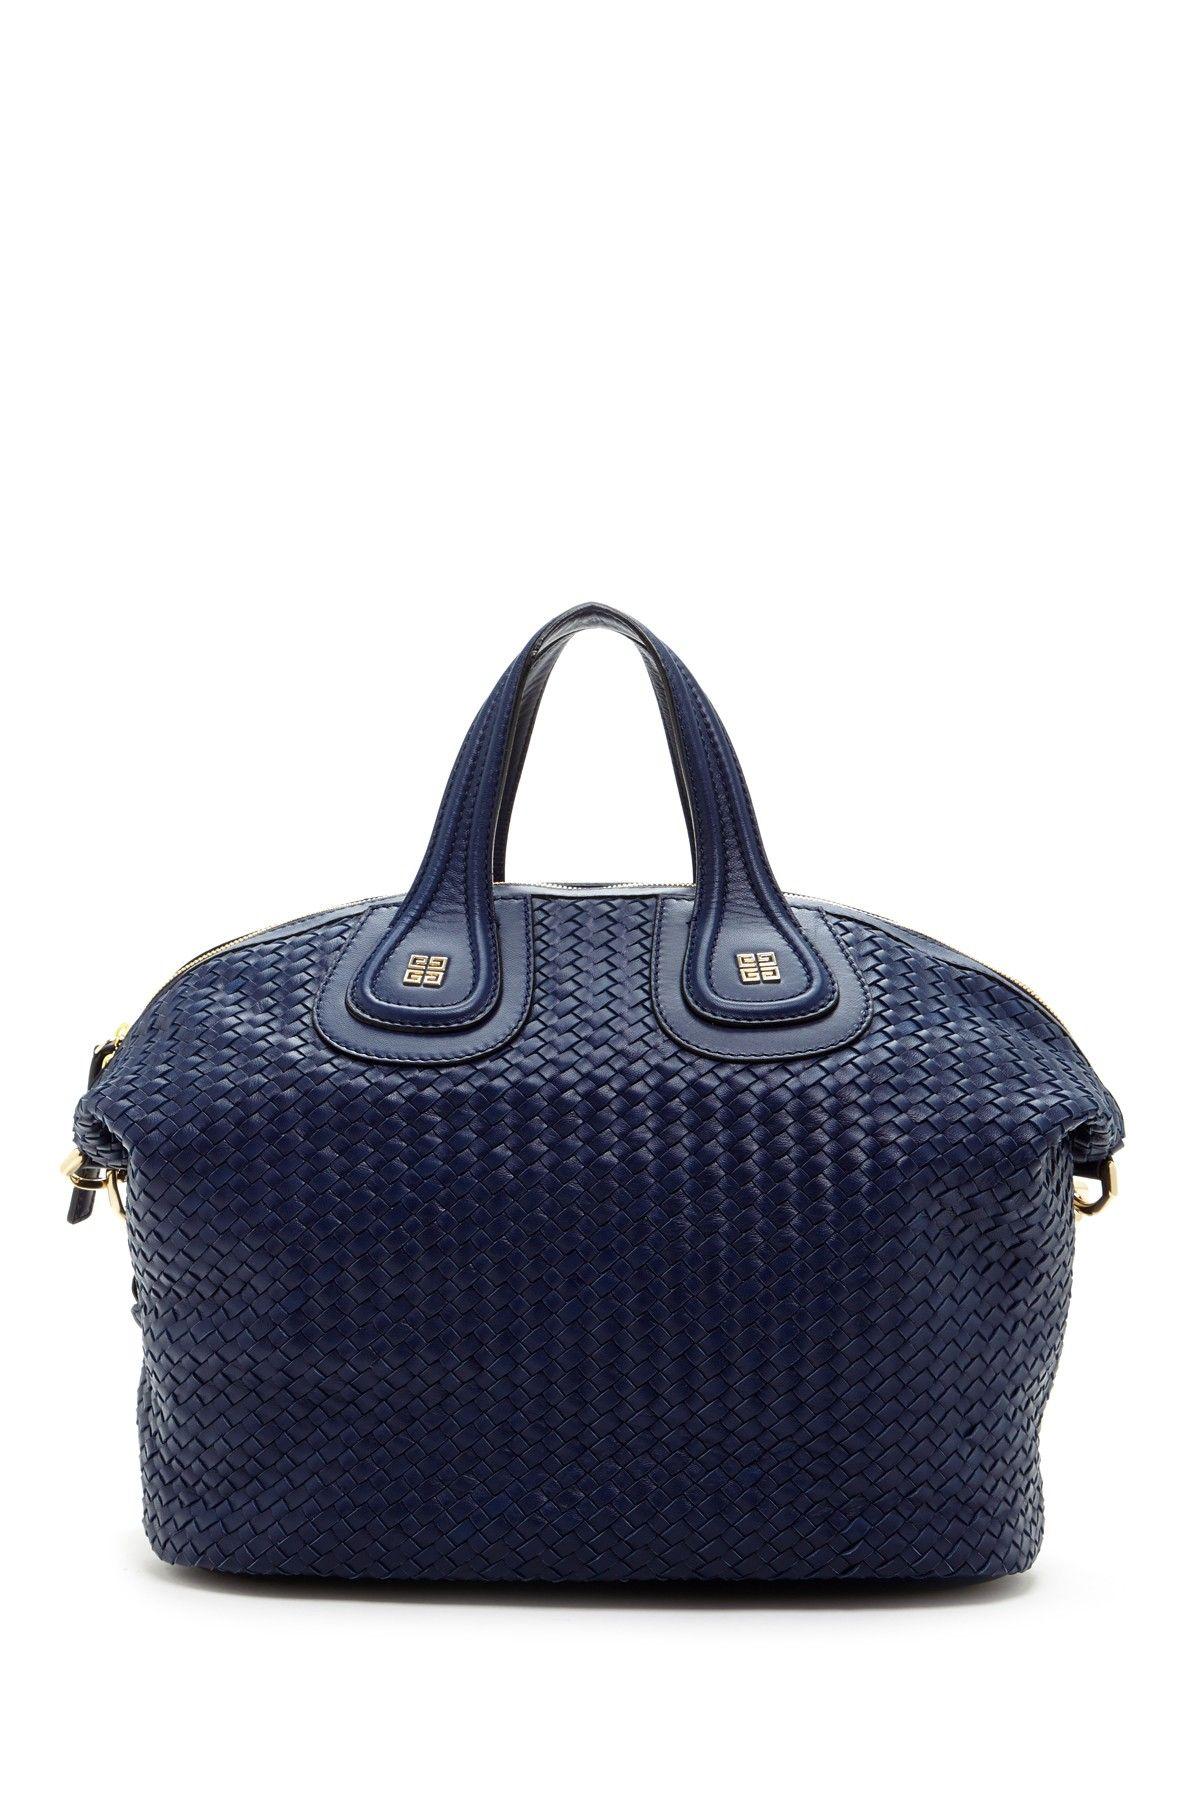 Givenchy Handbag  17ee232177698